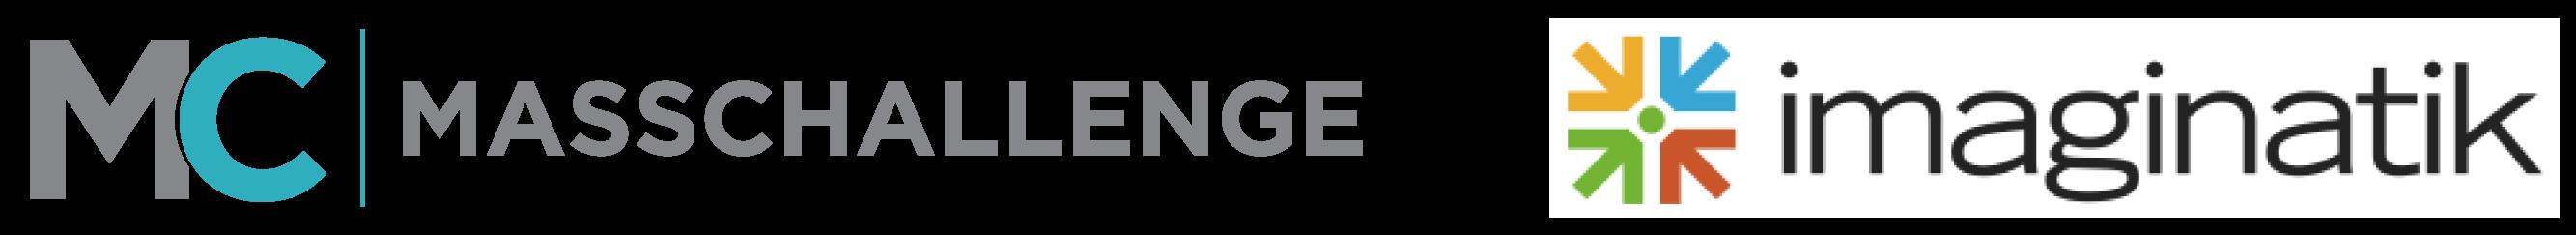 IMGTK_MC_Logo_Final-01.png